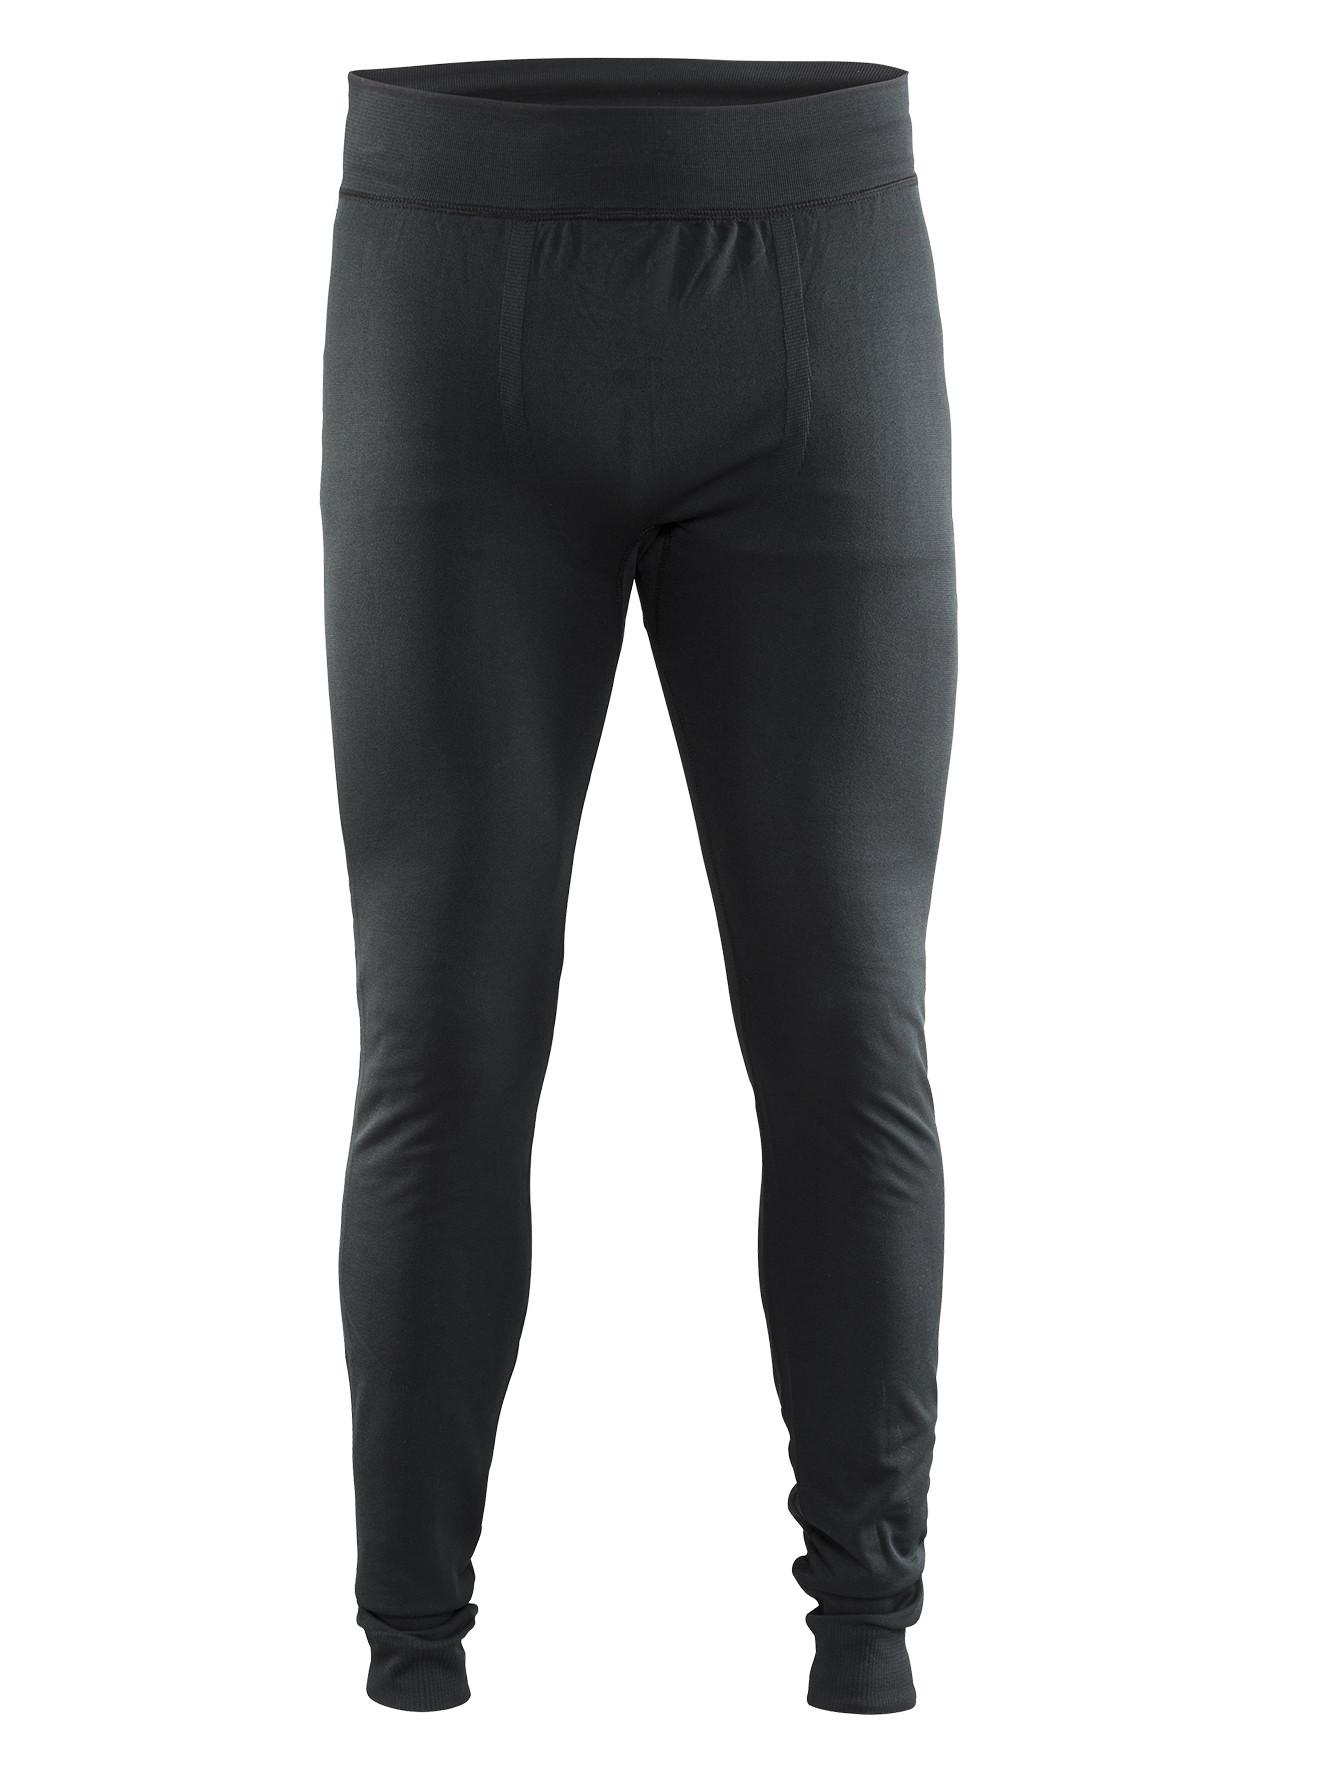 Термоштаны Craft Active Comfort Pants Man Black Solid S